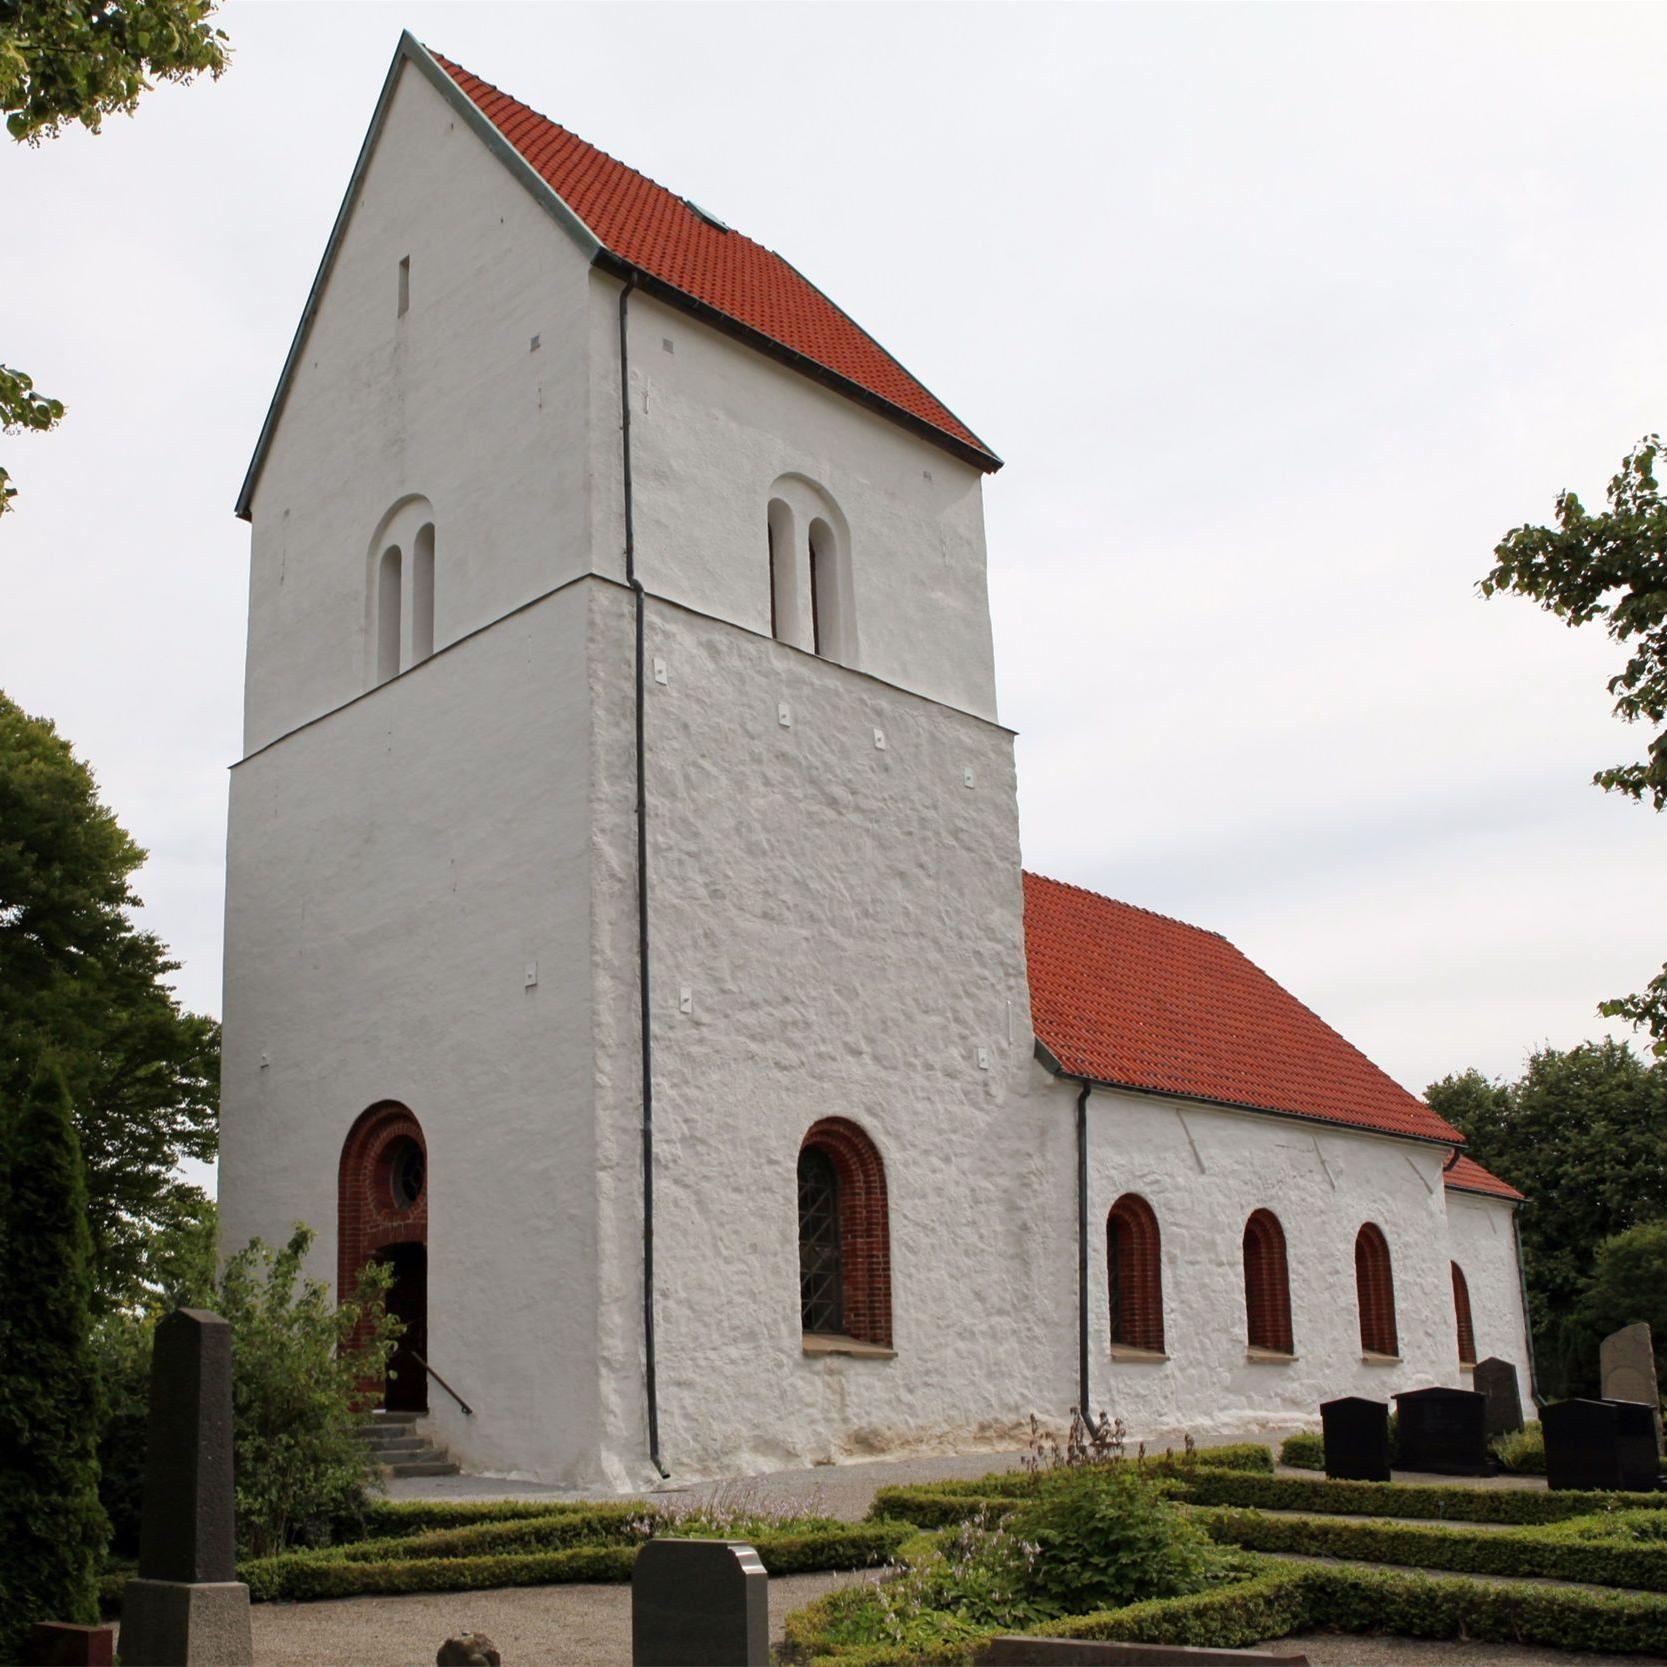 Lilla Harrie church